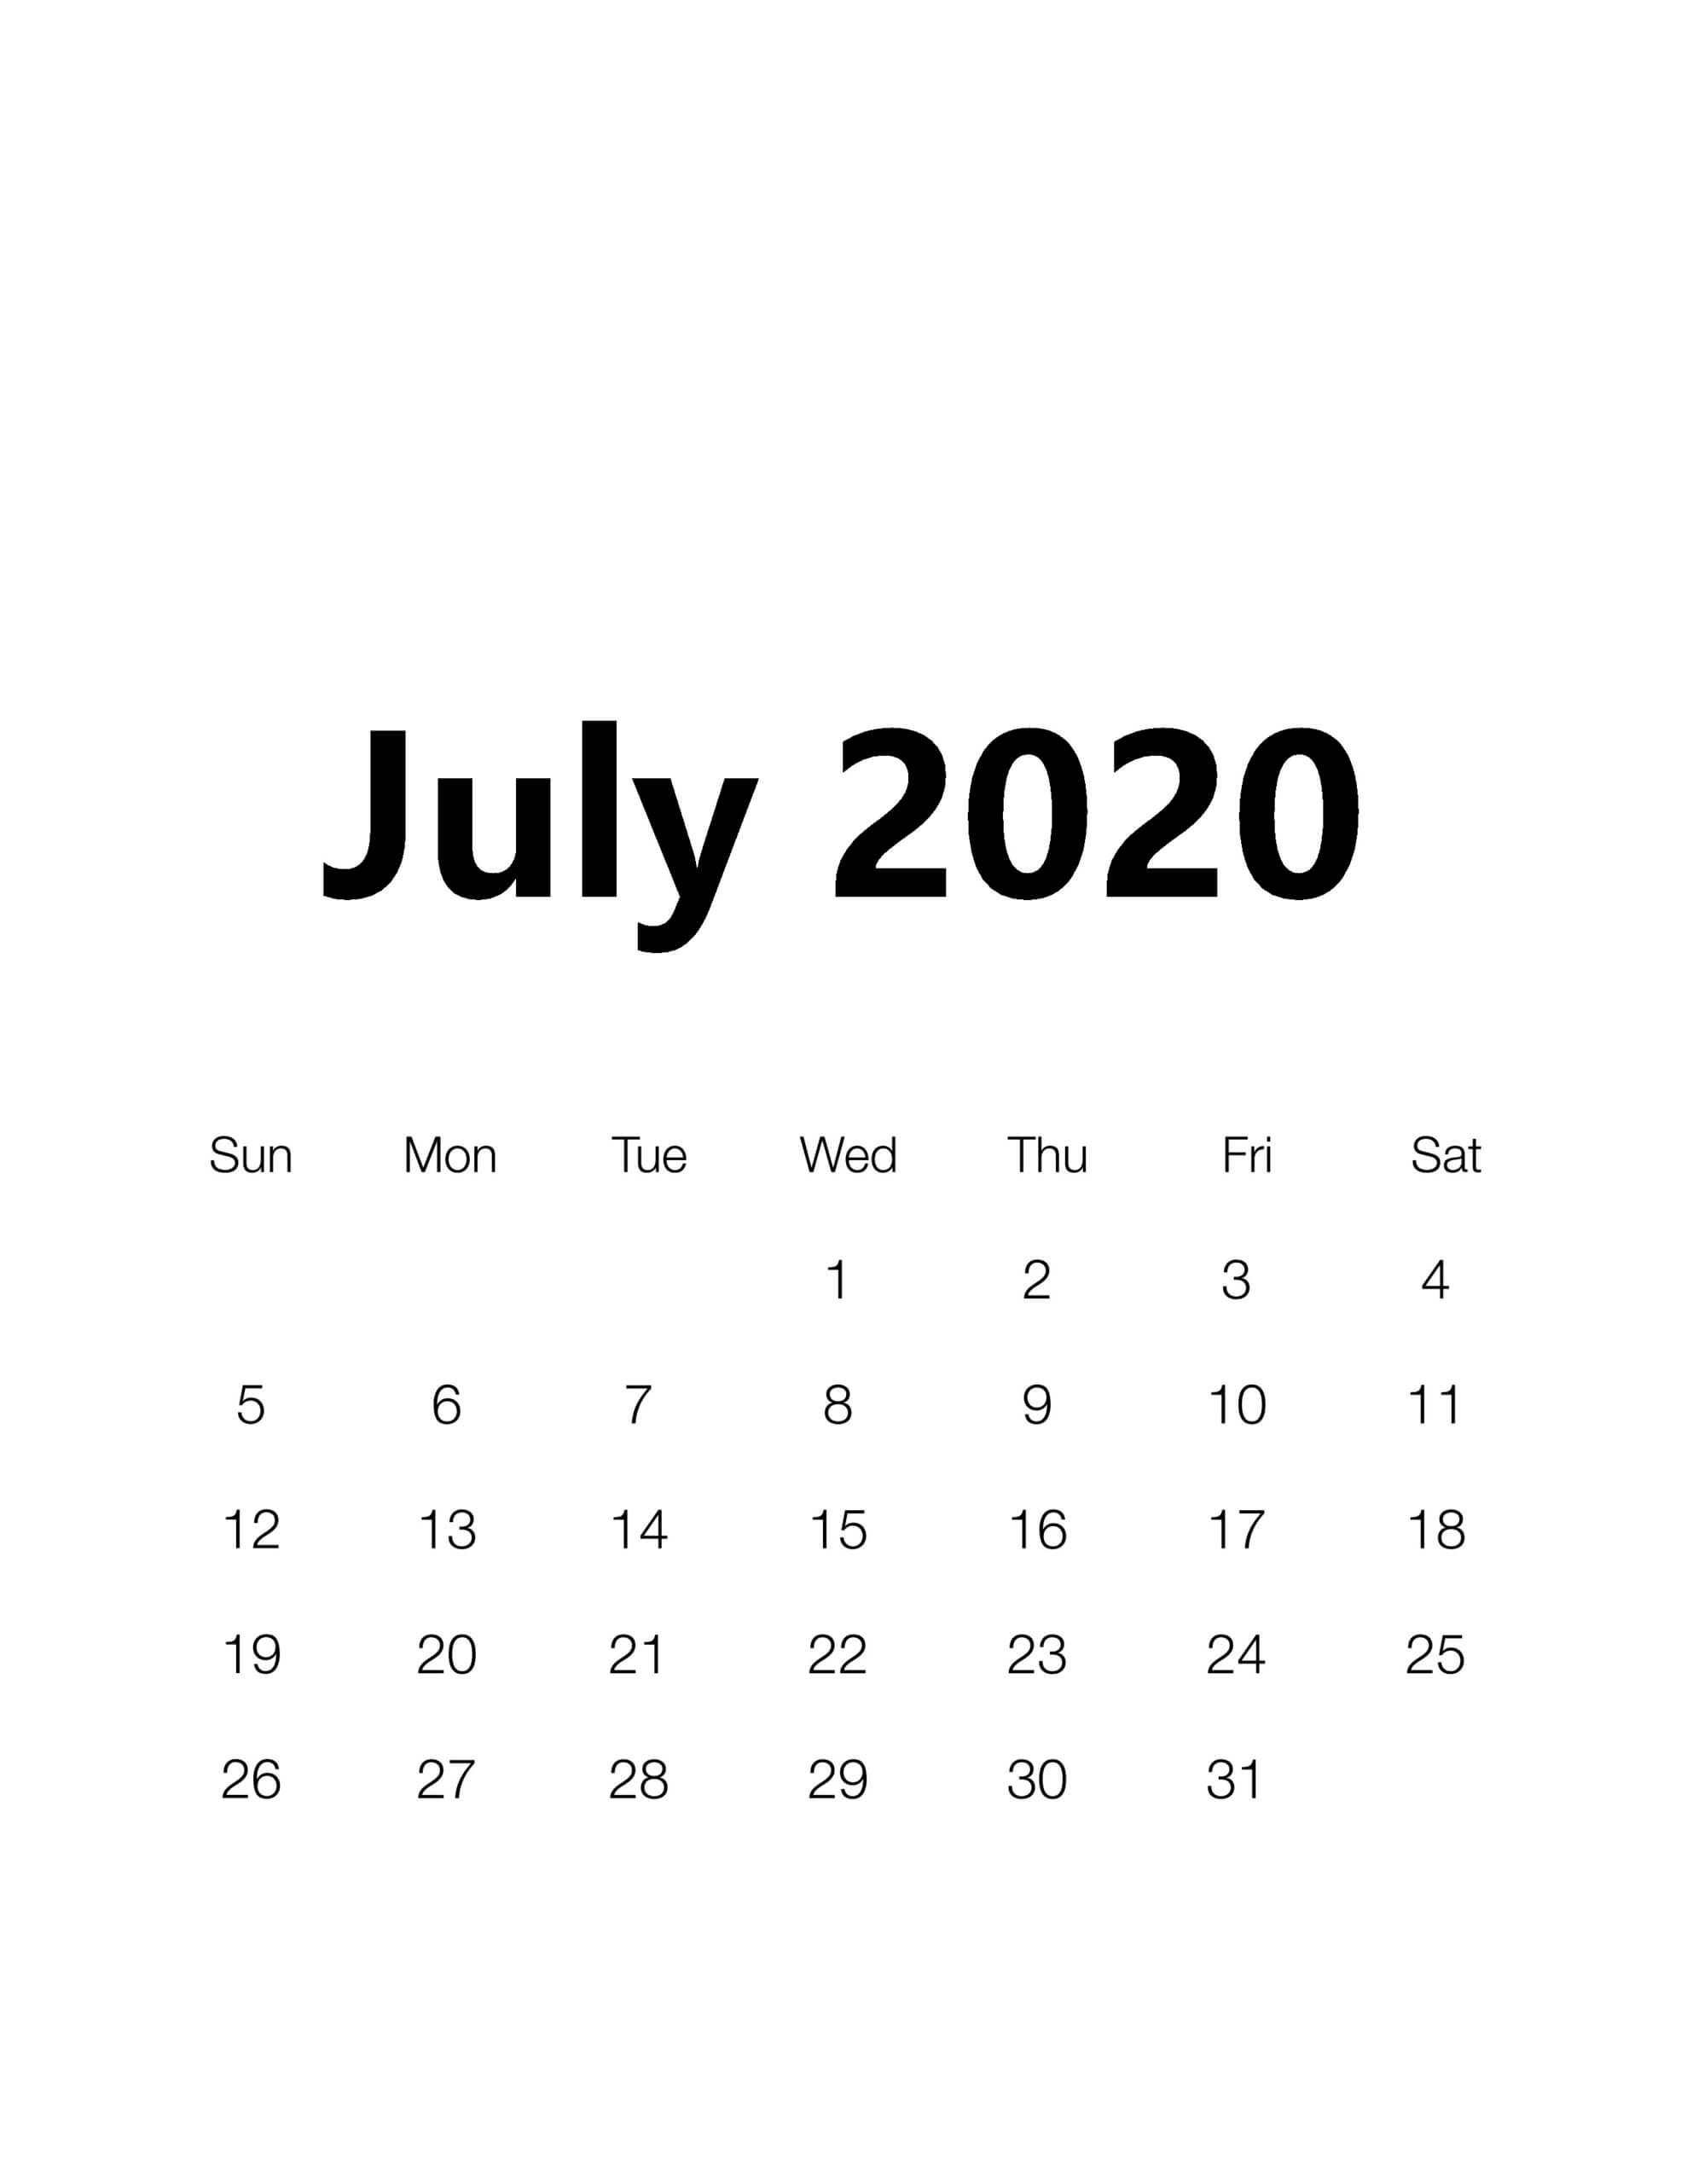 July 2020 Monthly Calendar